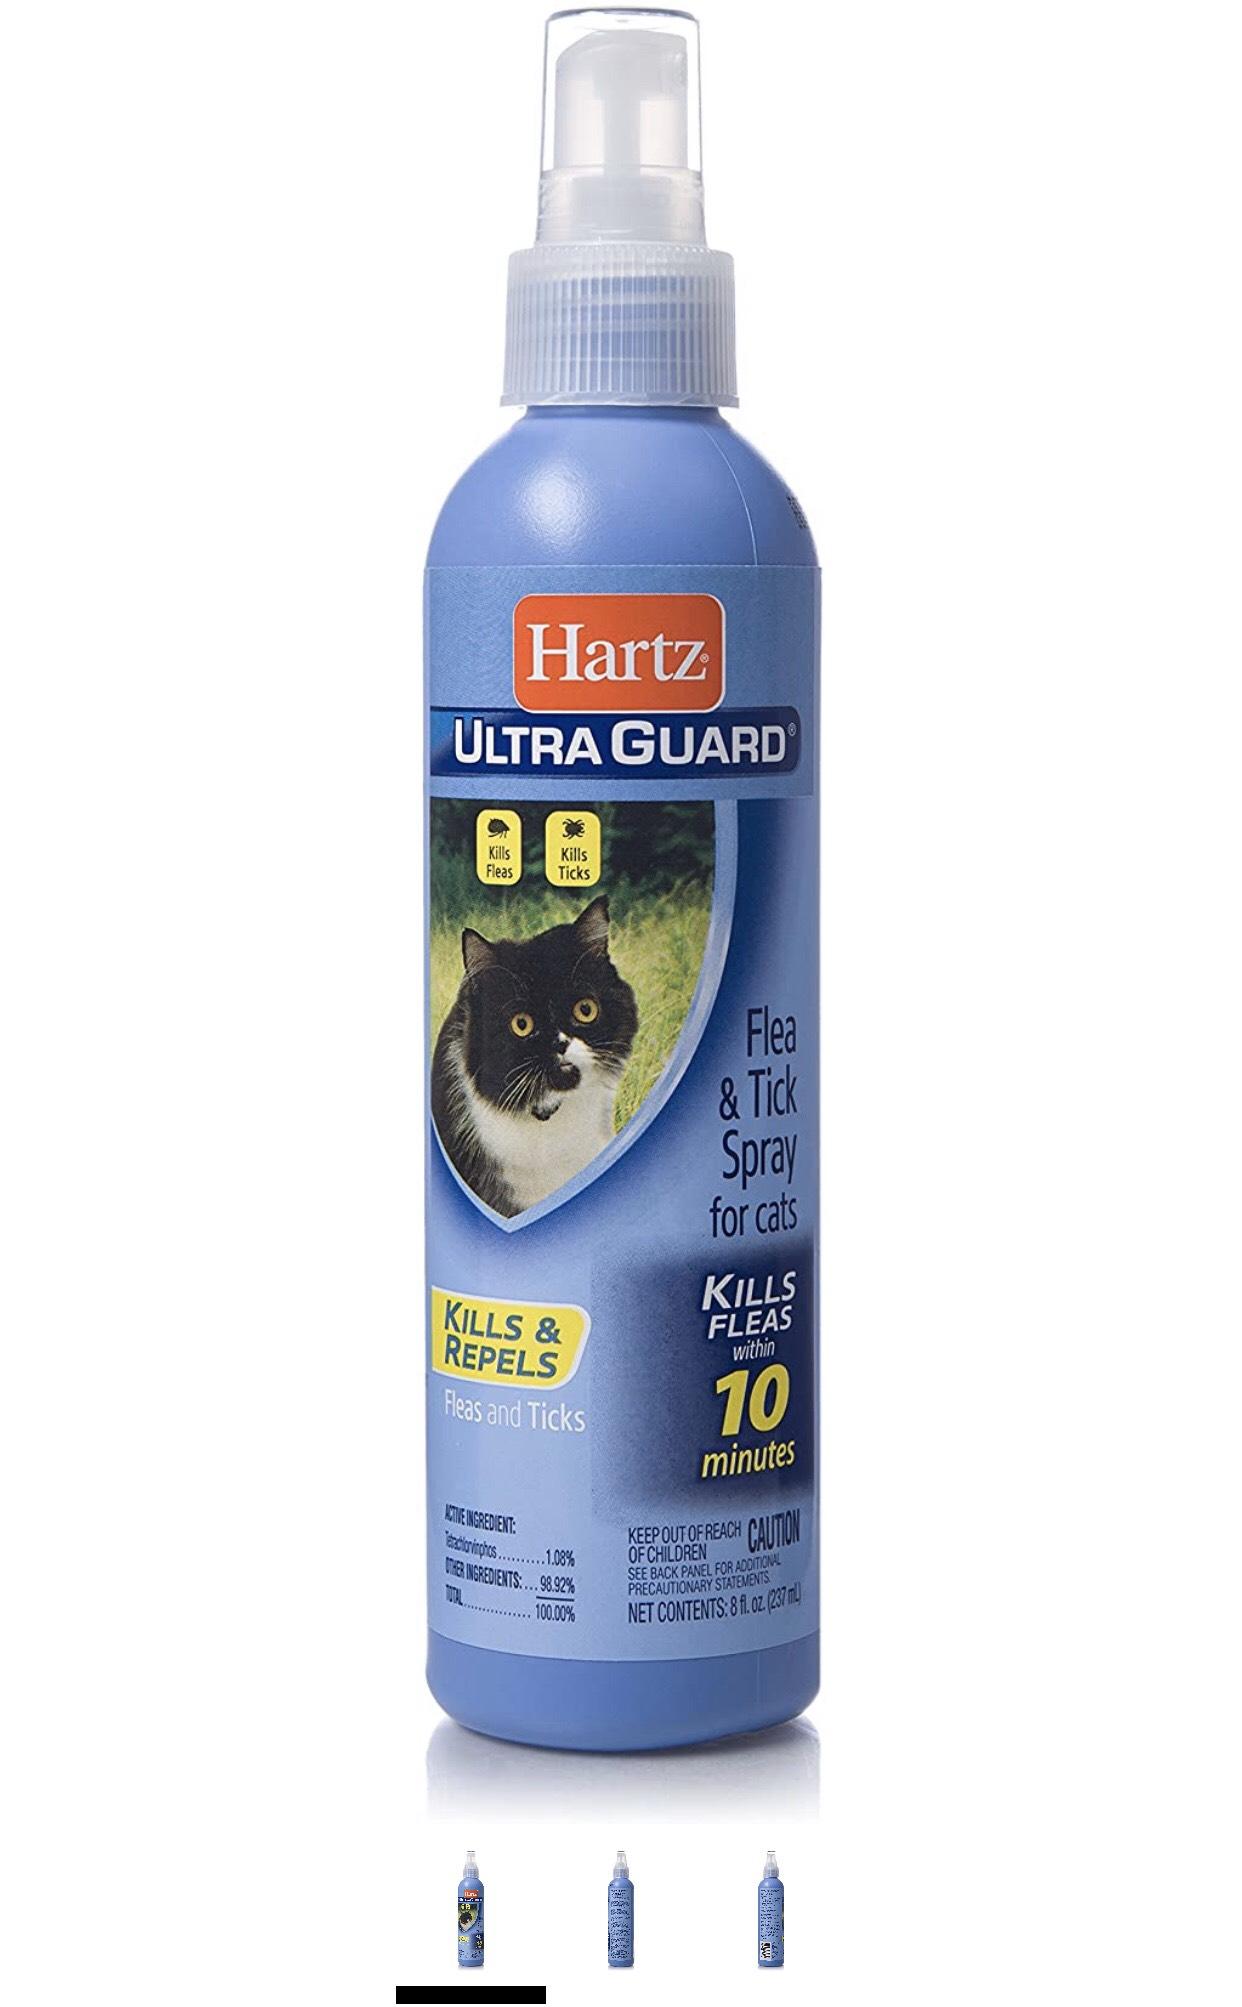 Hartz Ultra Guard Flea & Tick Spray for Cats